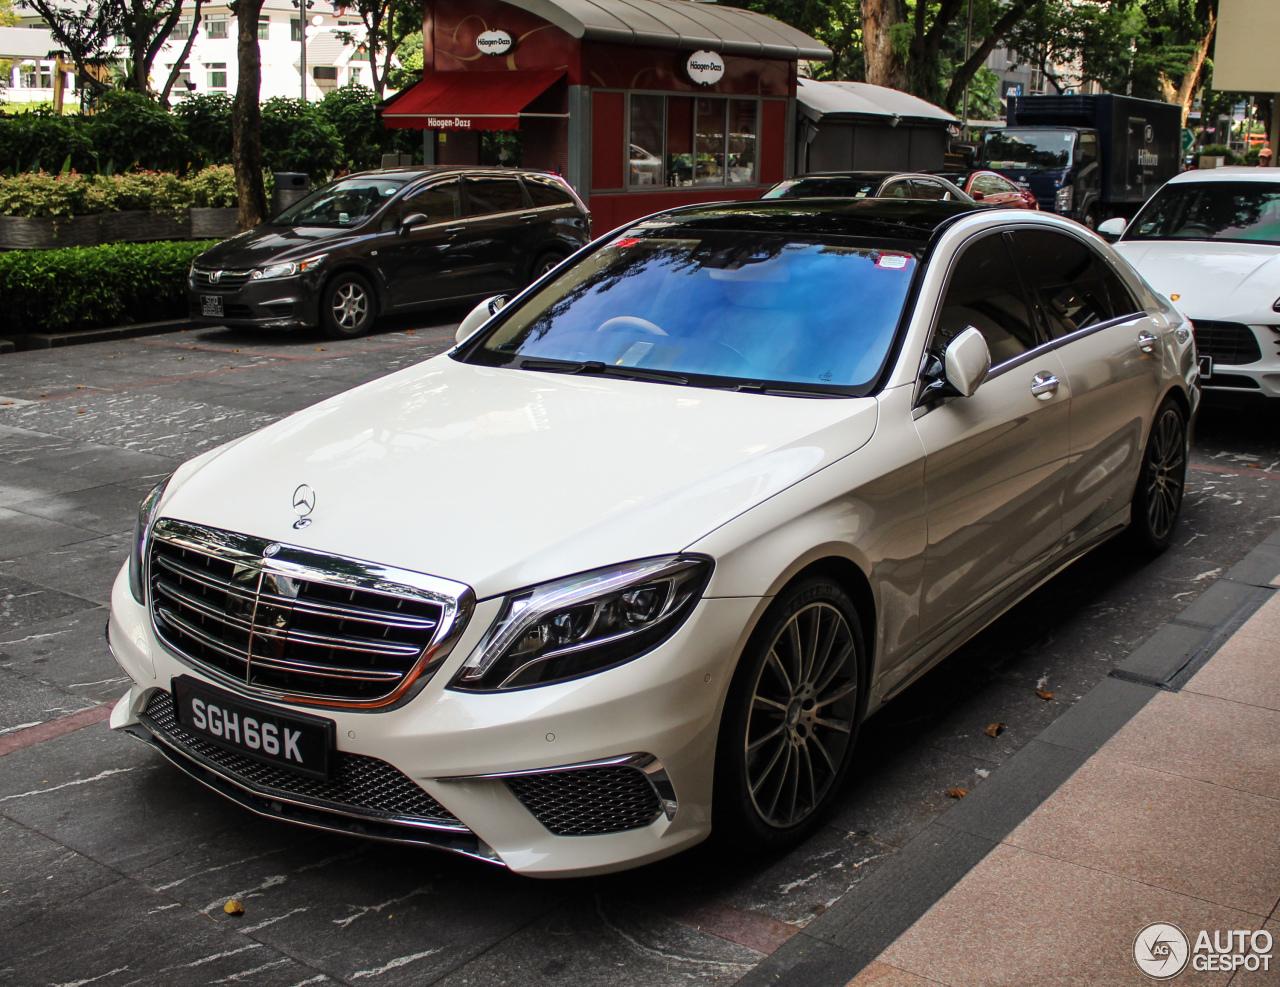 mercedes benz s 65 amg v222 30 january 2017 autogespot For2017 Amg S 65 Mercedes Benz